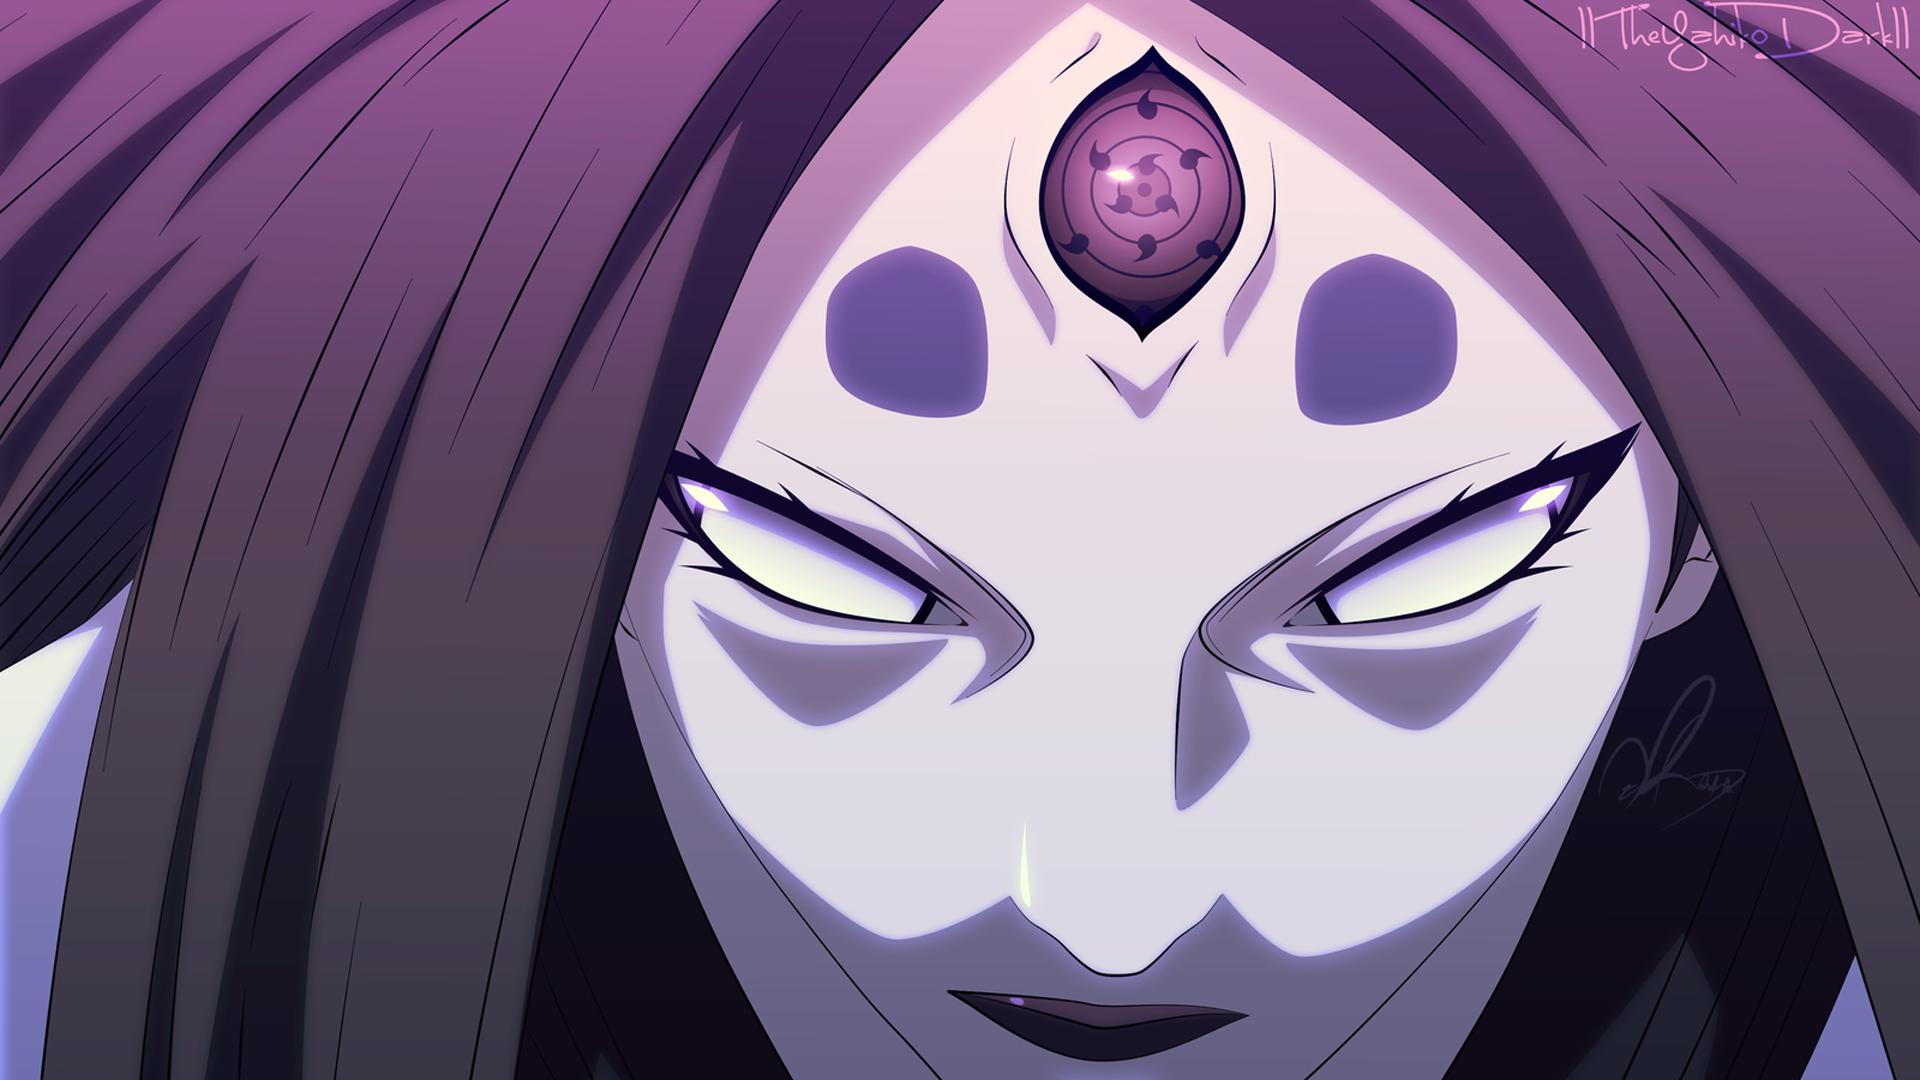 byakugan and rinnegan eyes anime girl hd 1920x1080 1080p wallpaper 1920x1080